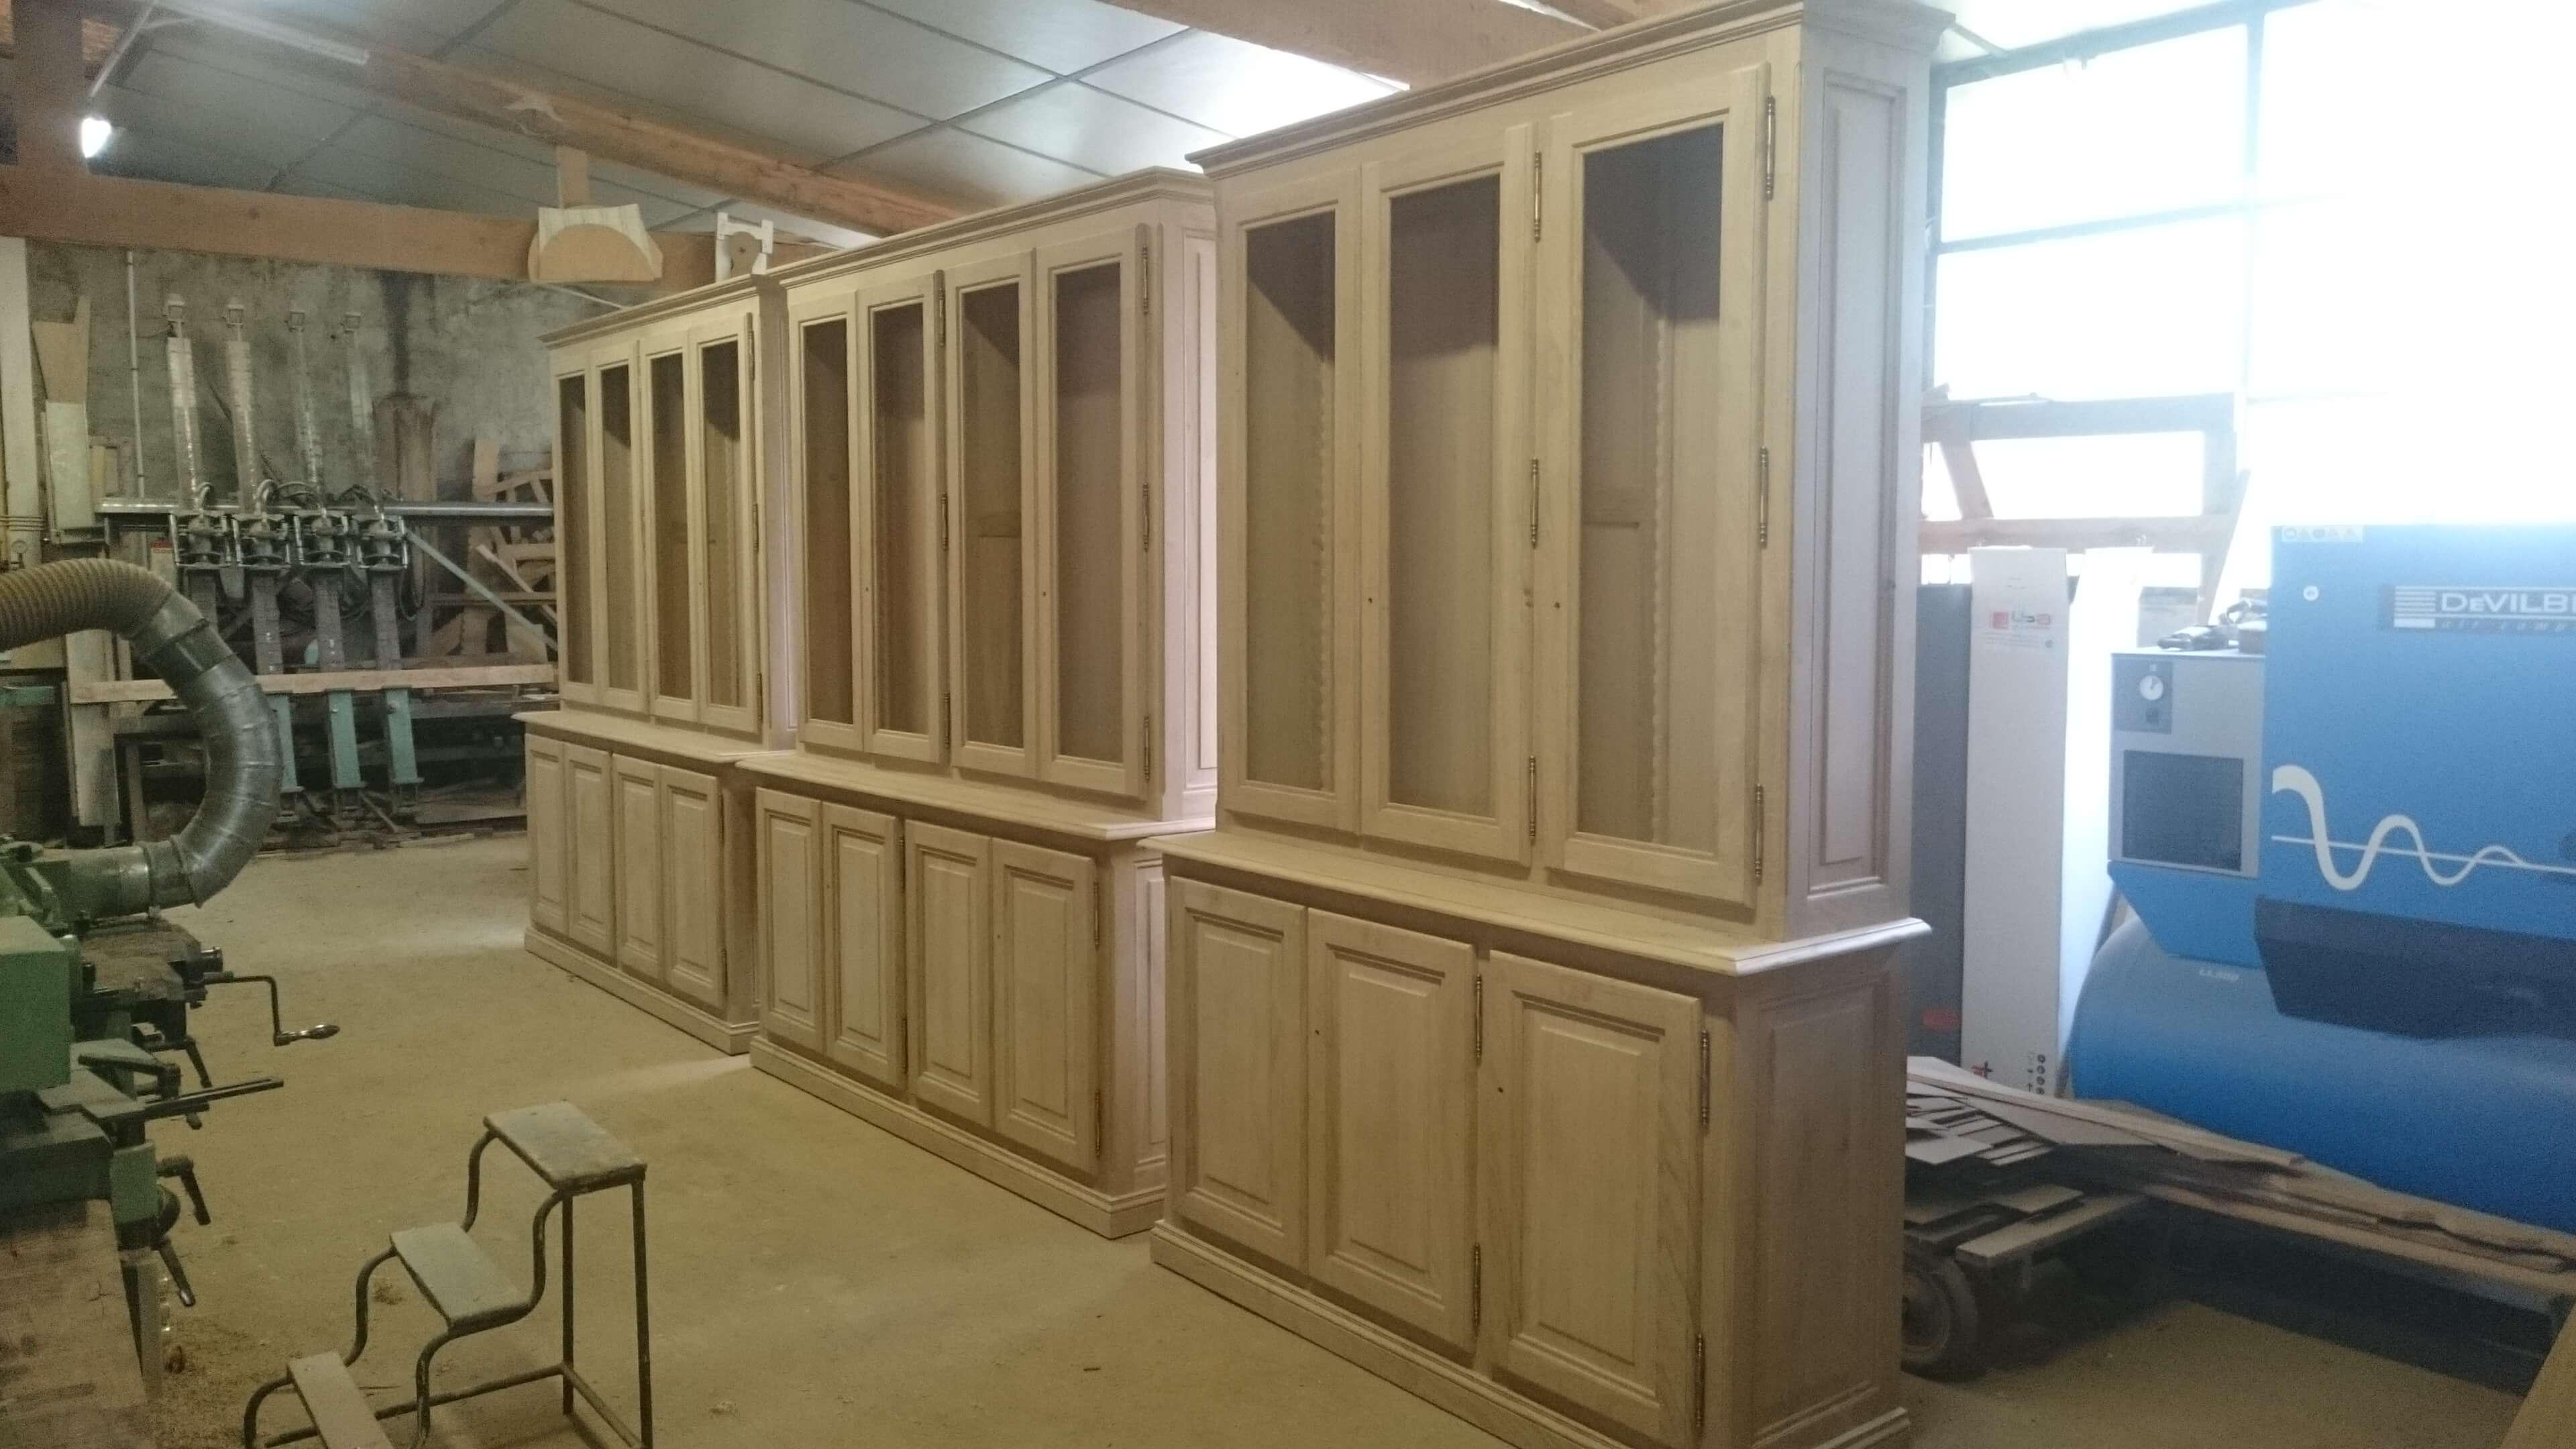 Menuiserie Figard - Fabrication sur mesure - Bibliothèque - Chêne - Vesoul